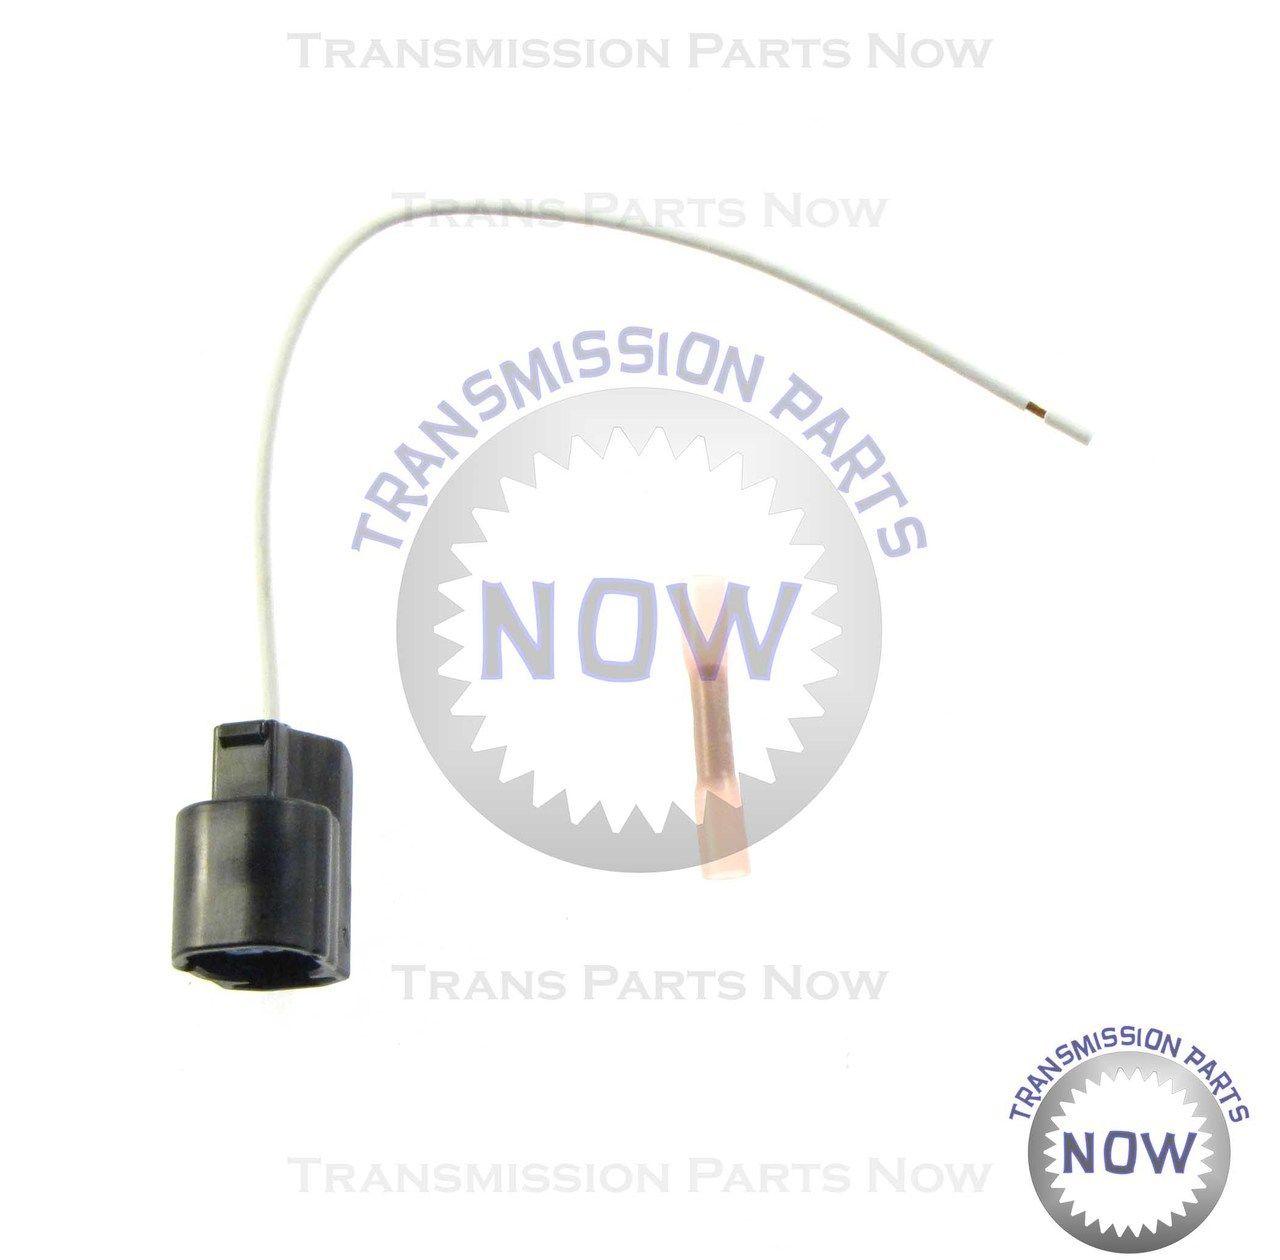 honda wiring repair pressure switch connector rostra 350 0147 honda wiring repair pressure switch connector rostra 350 0147 transpartsnow